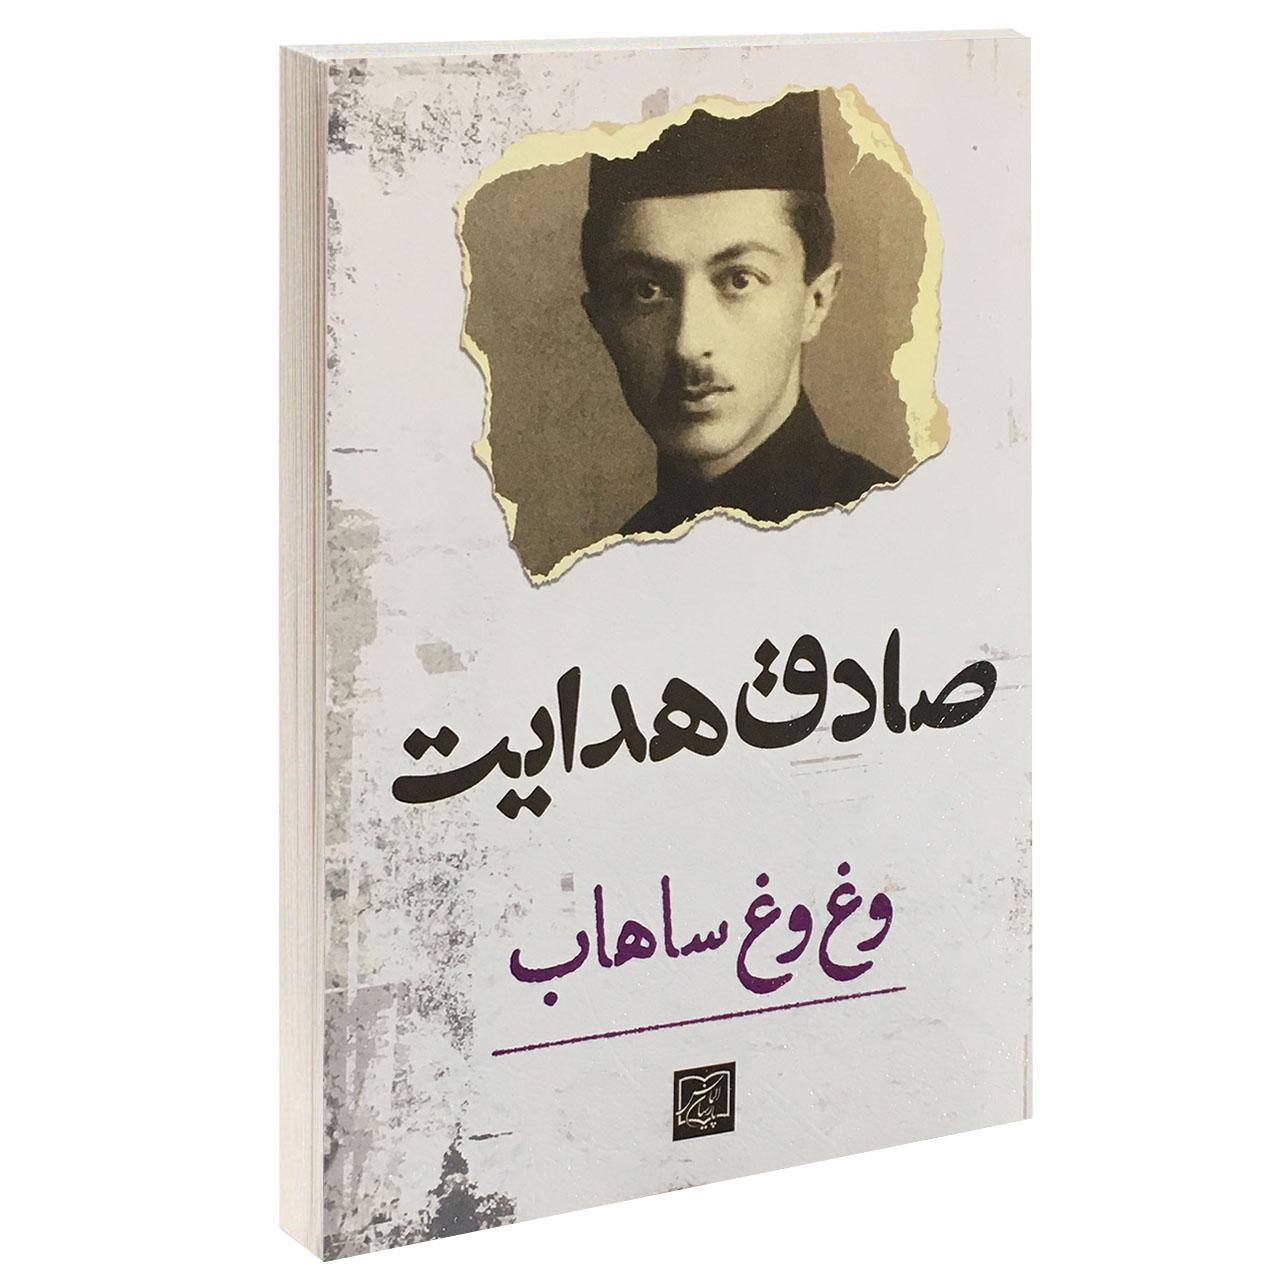 کتاب وغ وغ ساهاب اثر صادق هدایت انتشارات الماس پارسیان